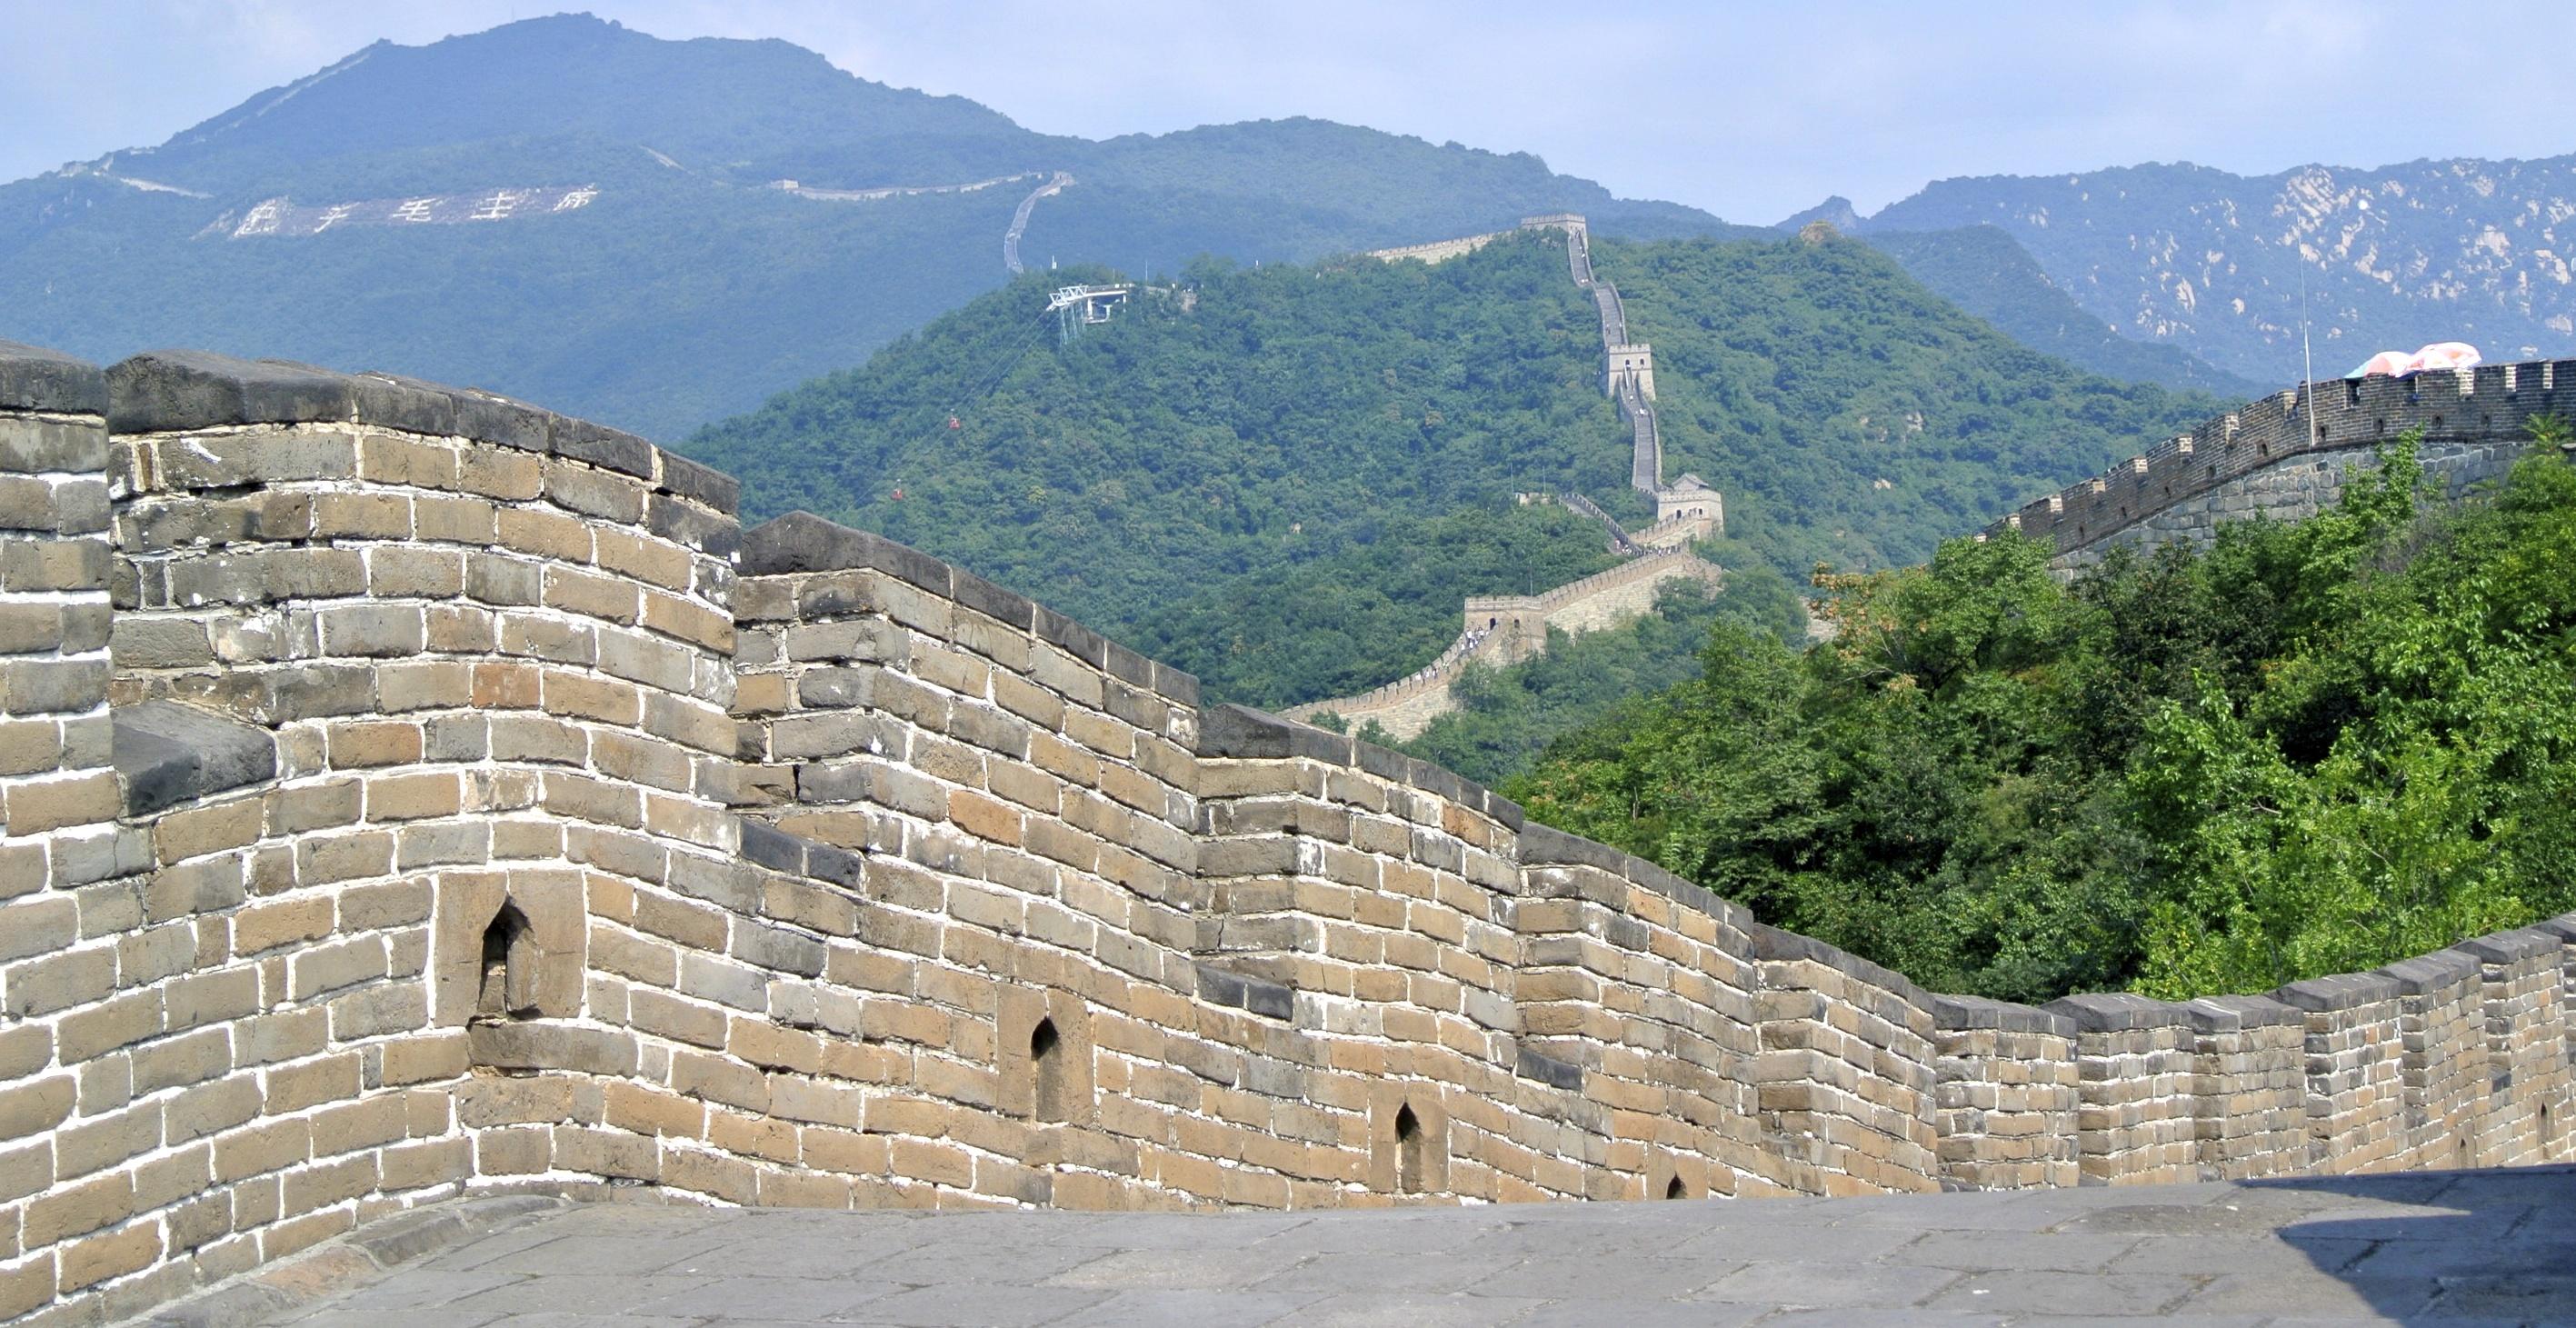 A grande muralha da china aurevoirblog for A grande muralha da china